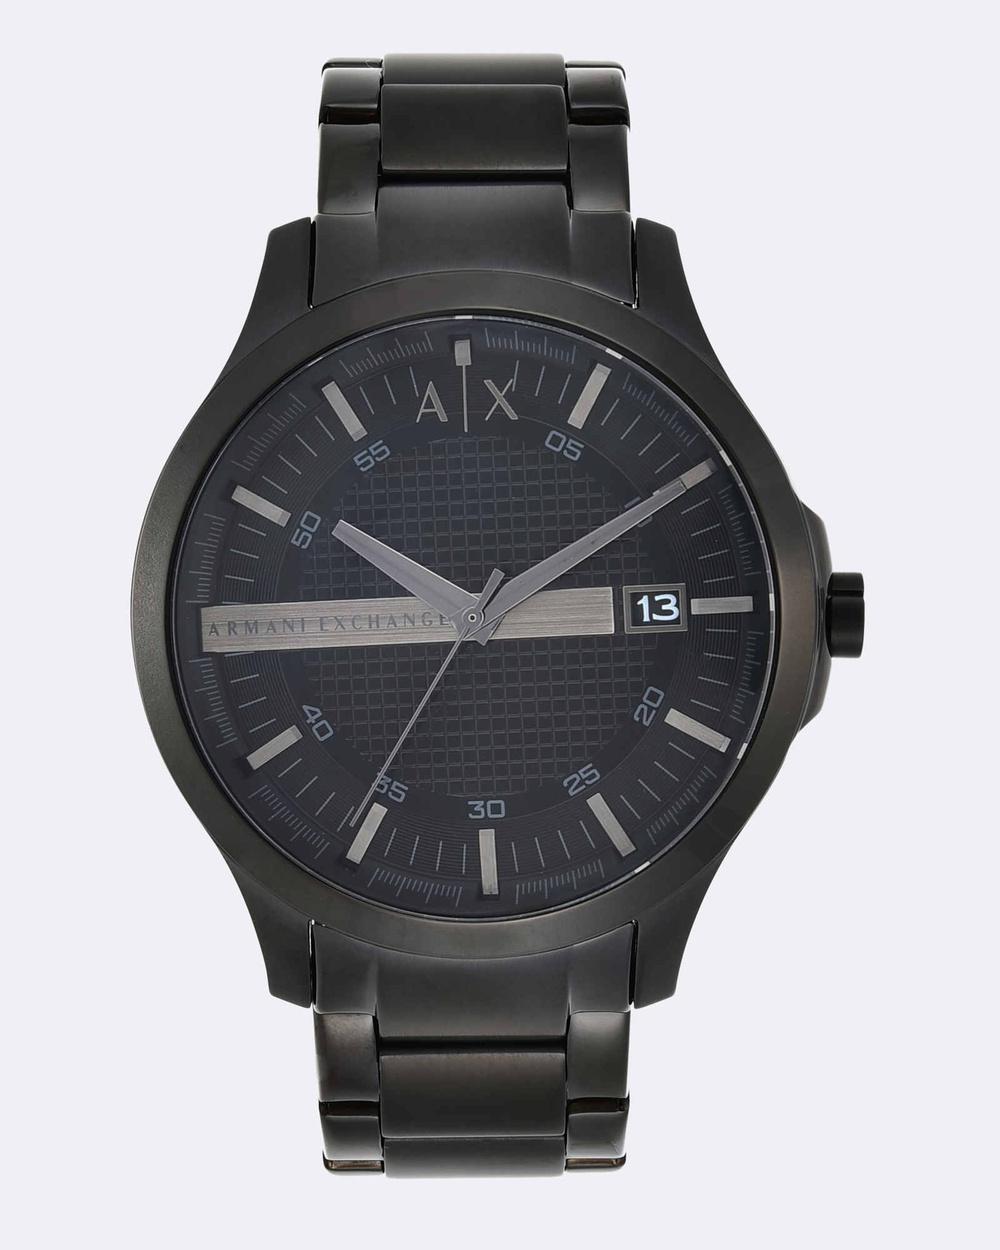 Armani Exchange Black Analogue Watch AX2104 Watches Black